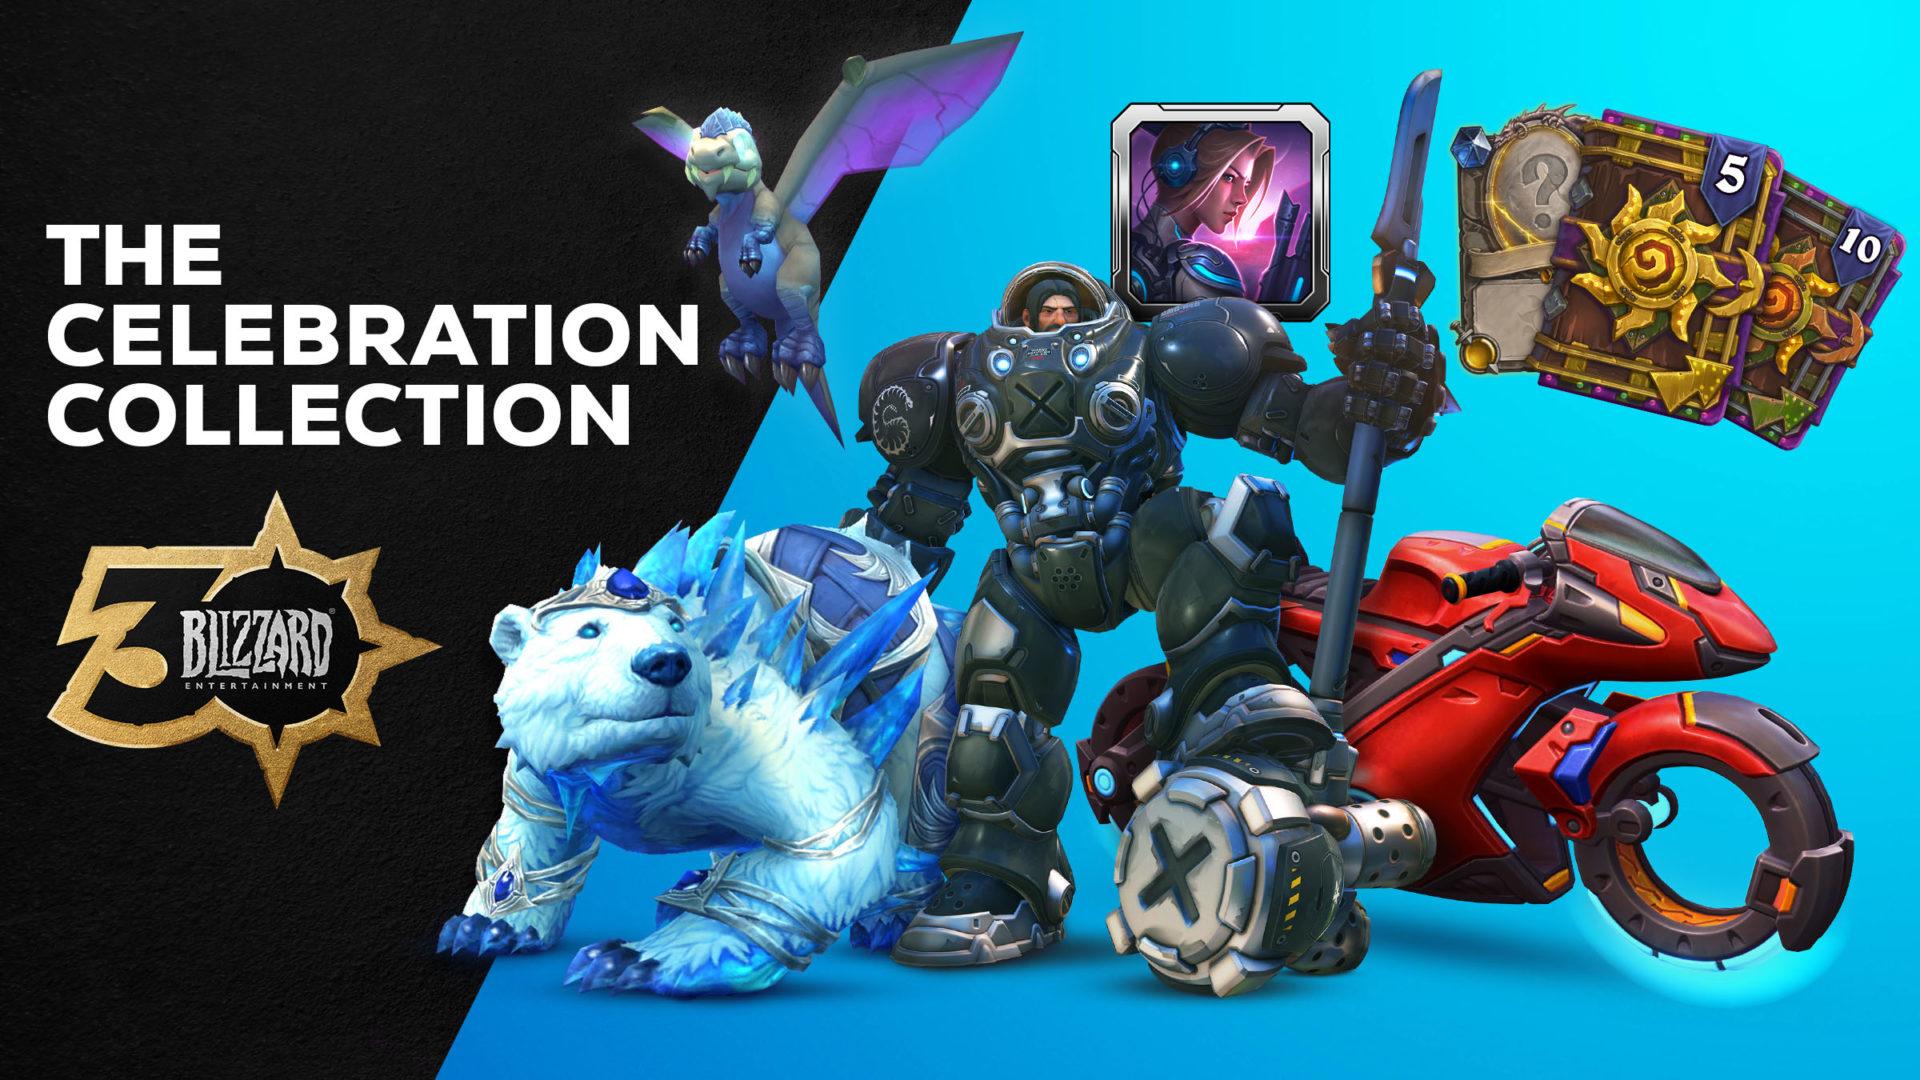 BlizzConline 30th anniversary Blizzard